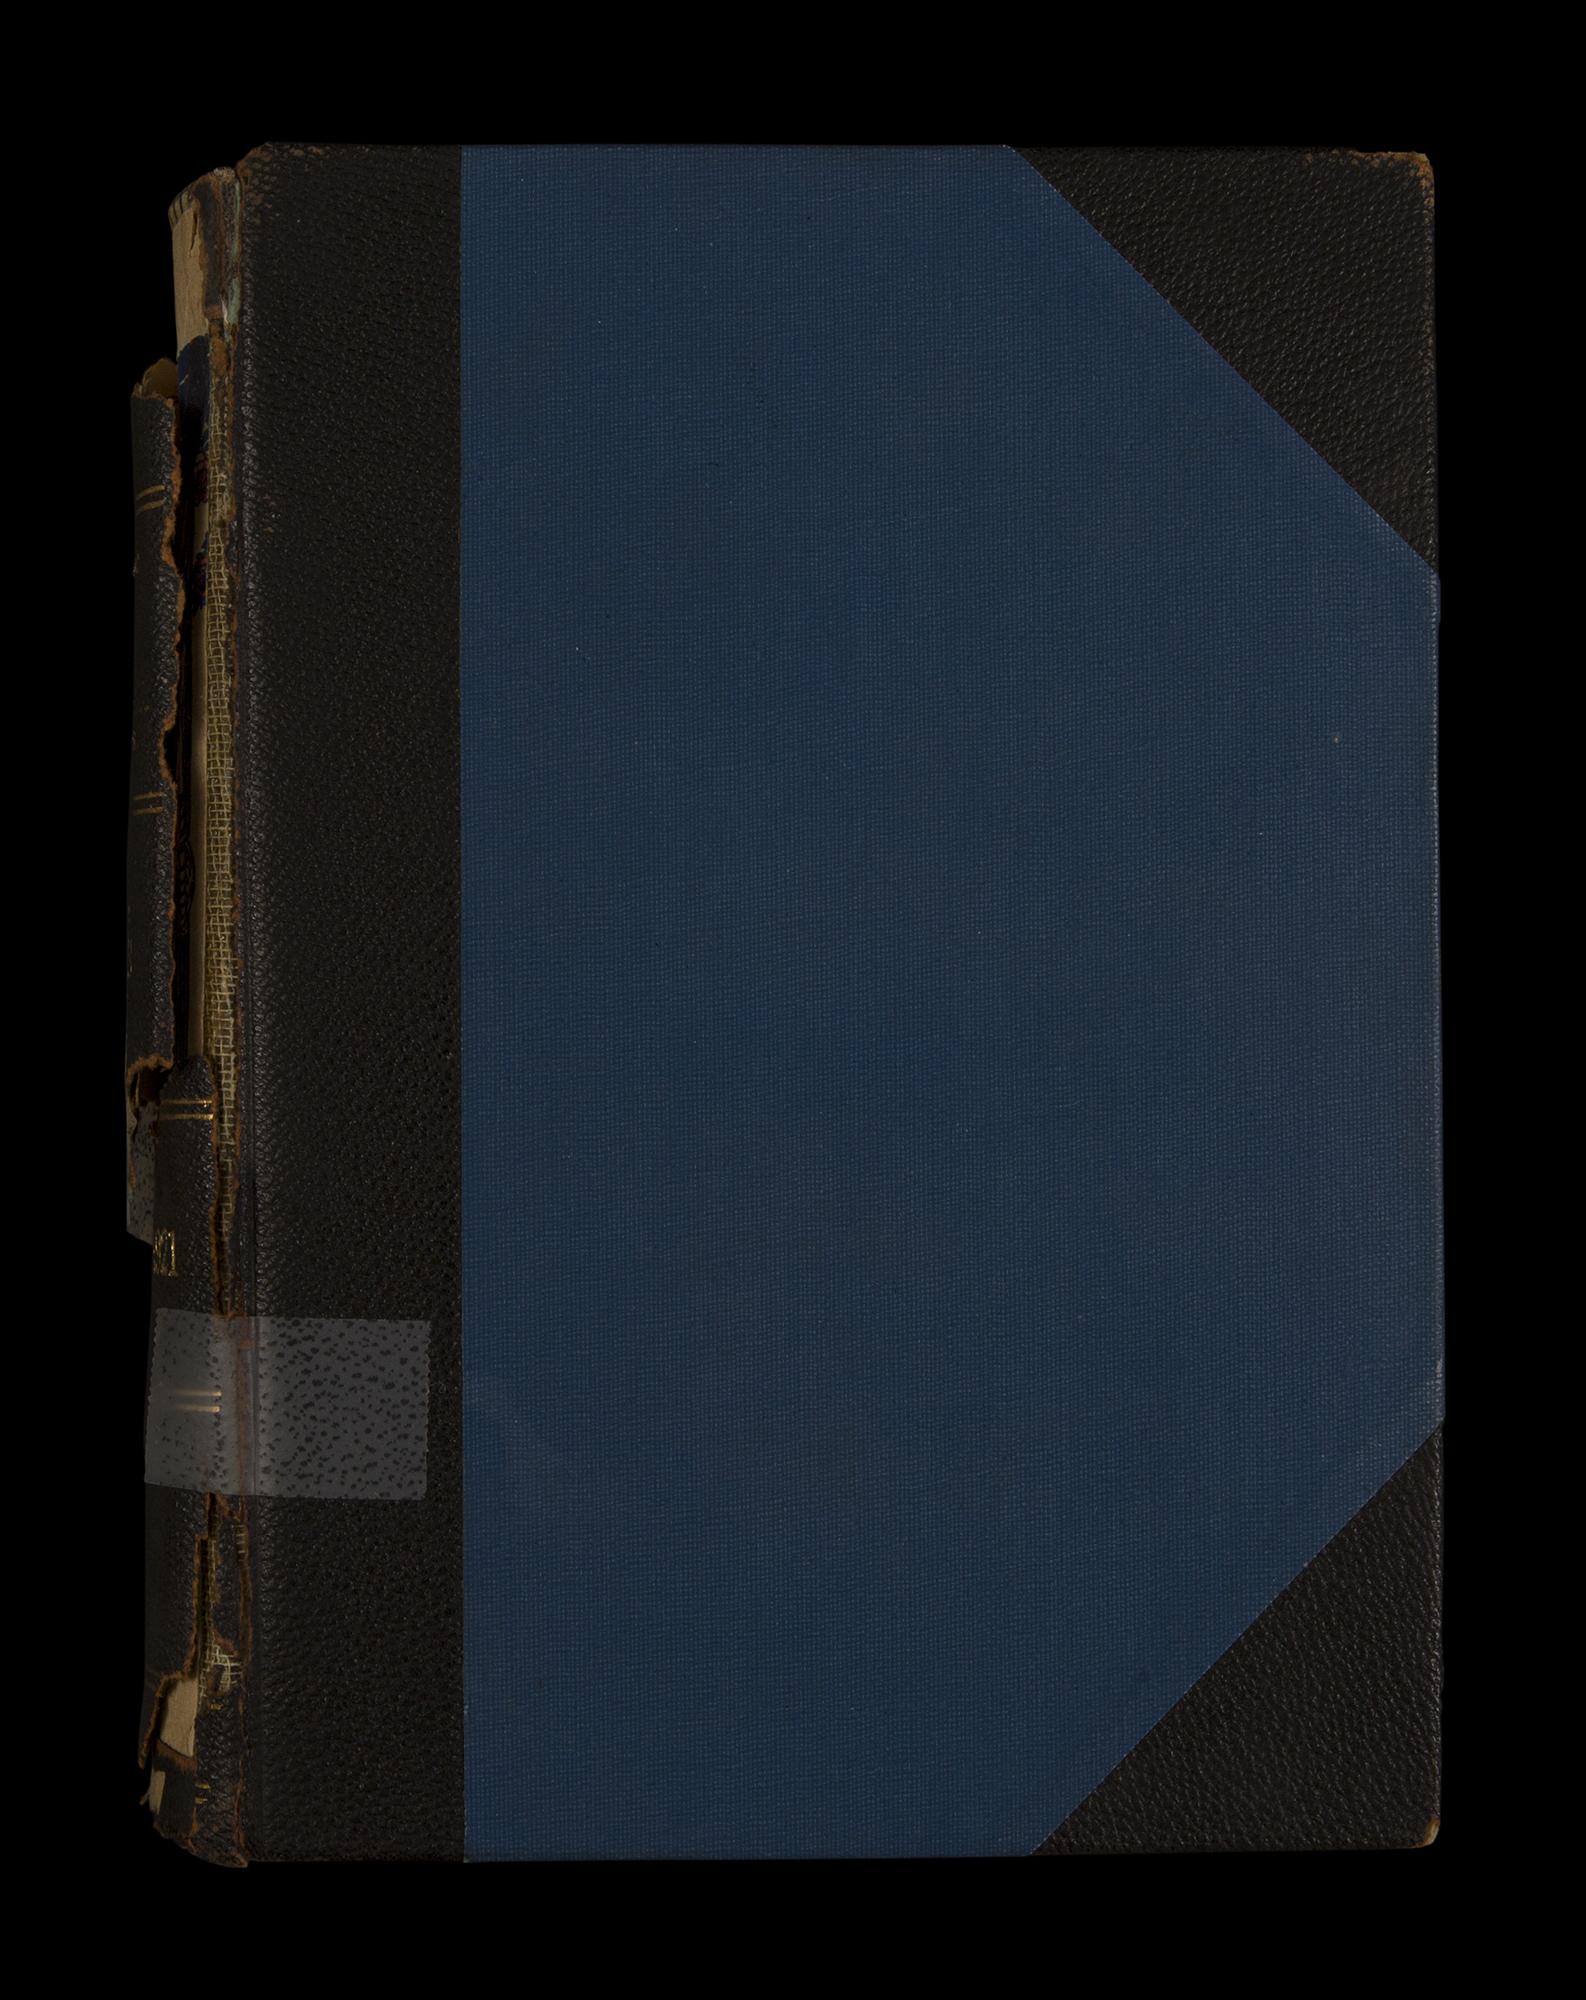 LAPO_ProgramBook_Cover_1920-1921.jpg